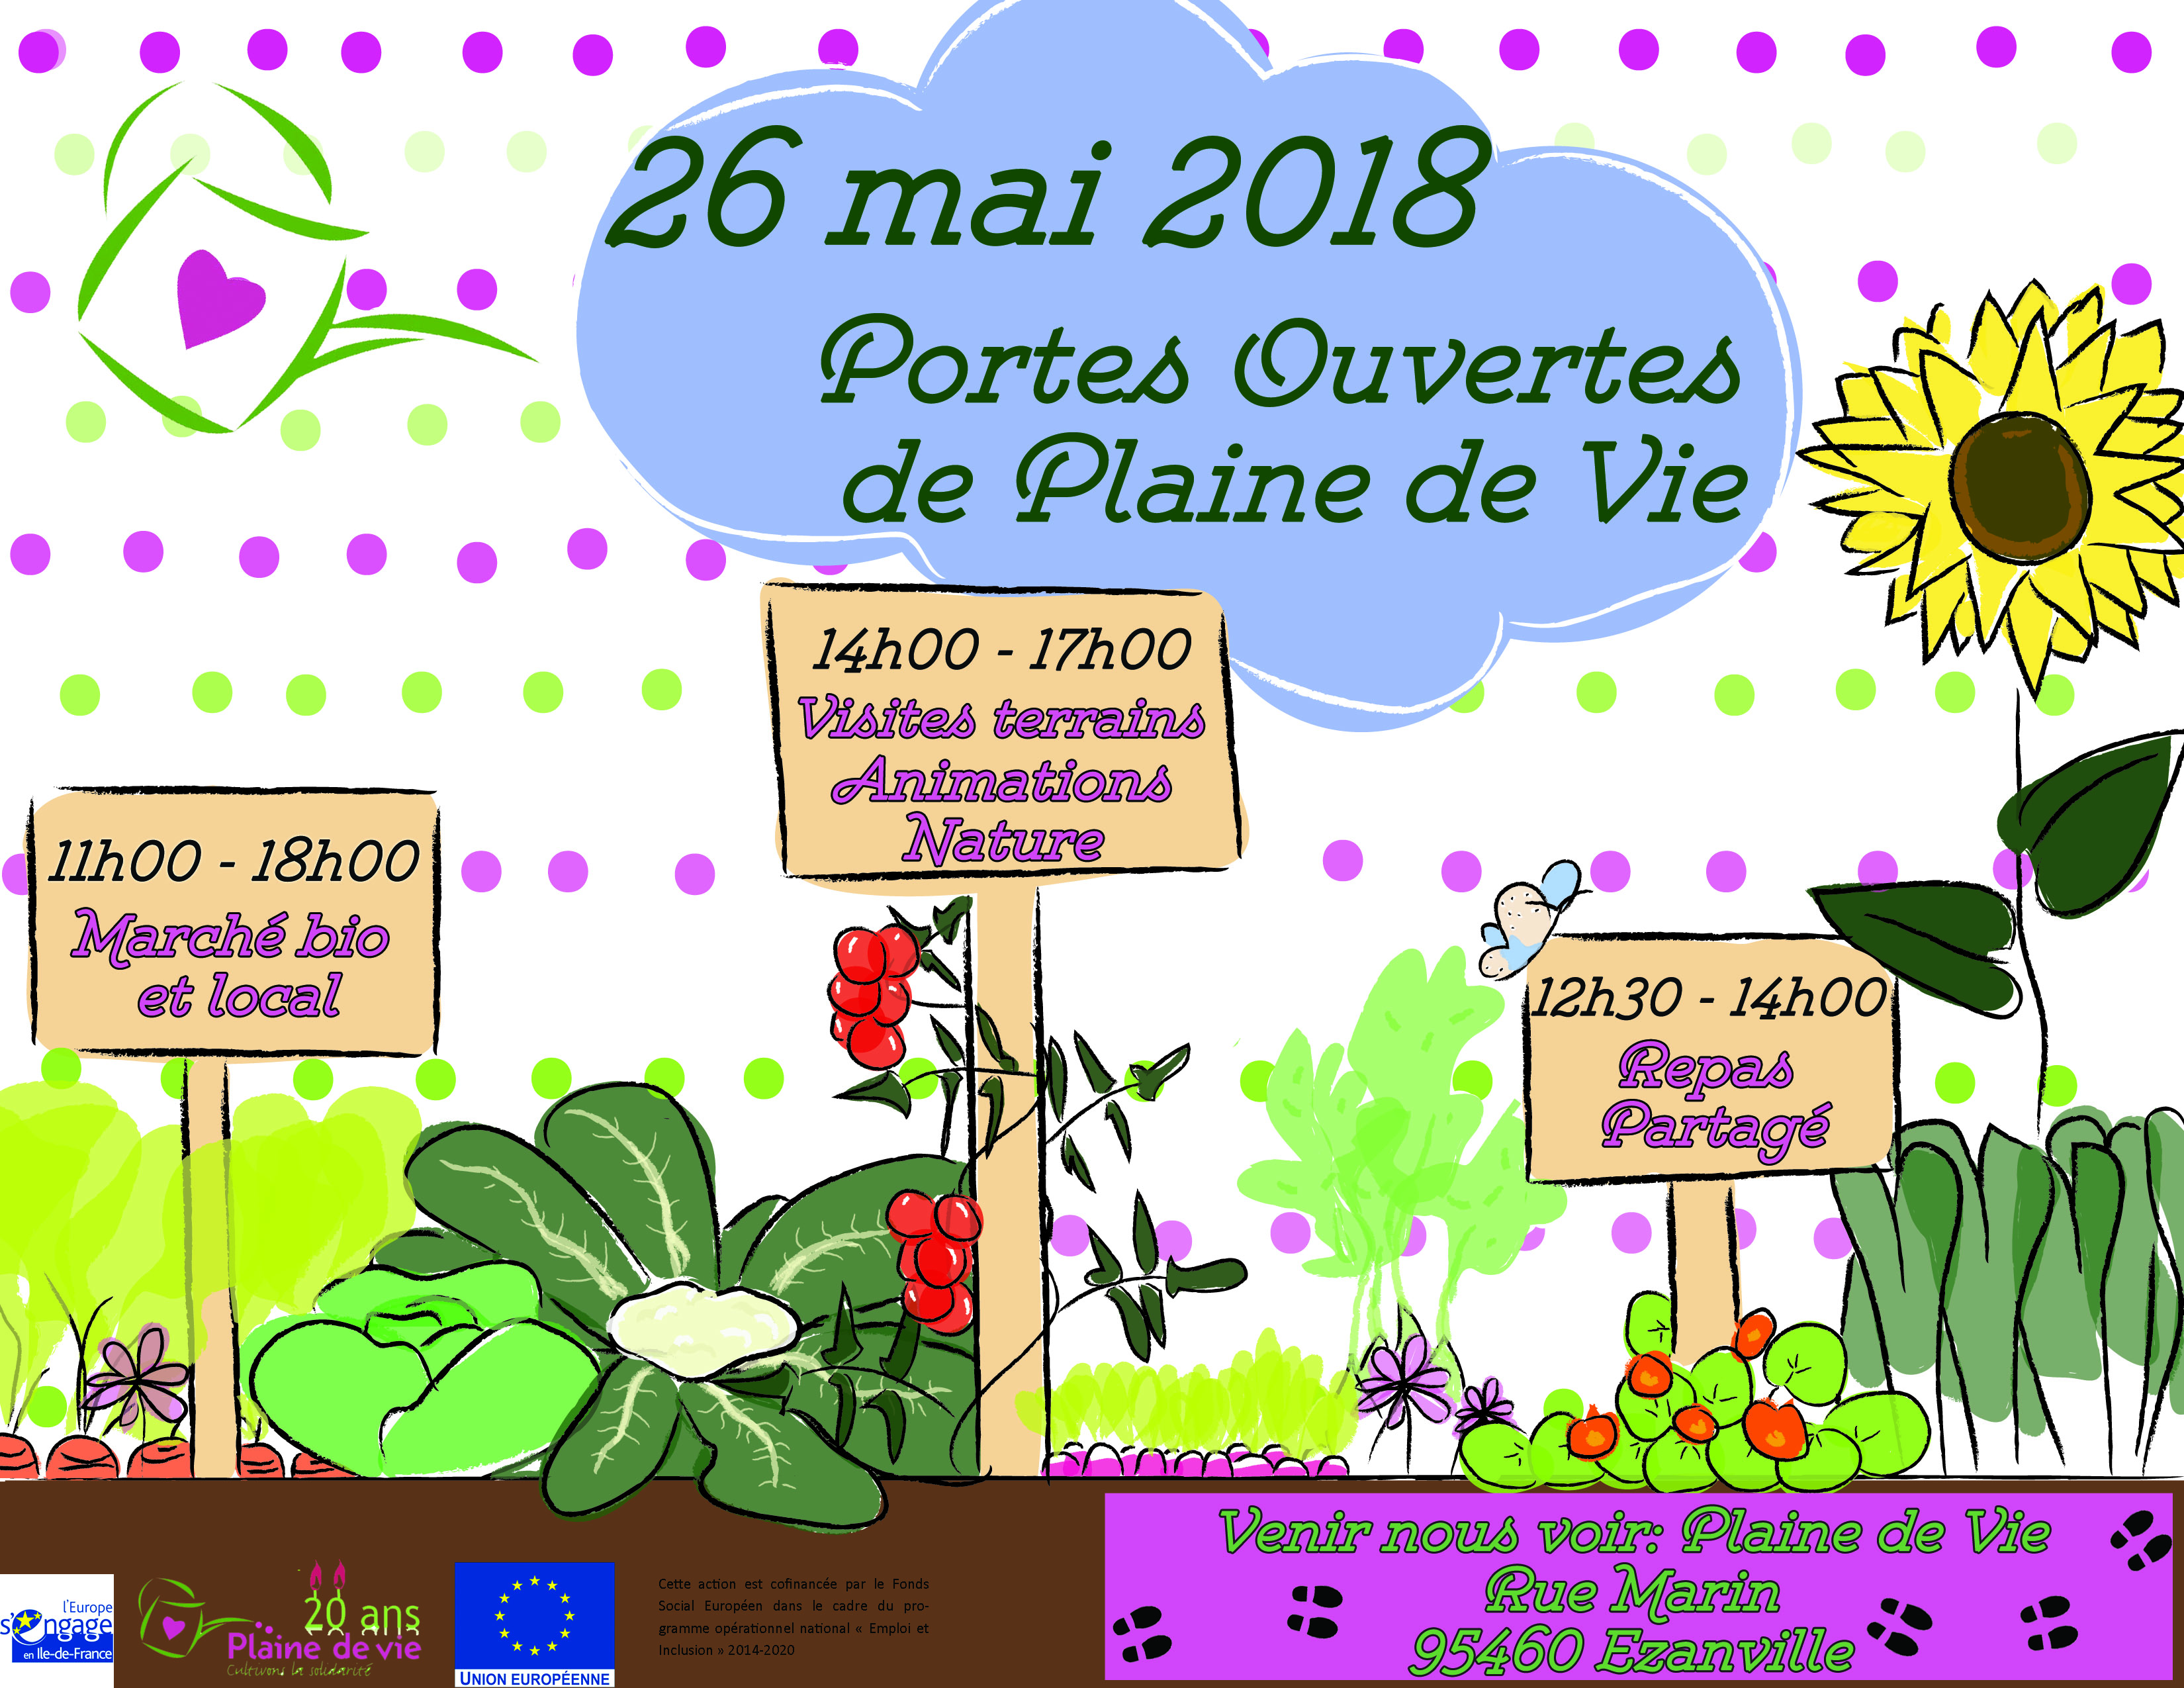 Portes Ouvertes Samedi 26 mai 2018